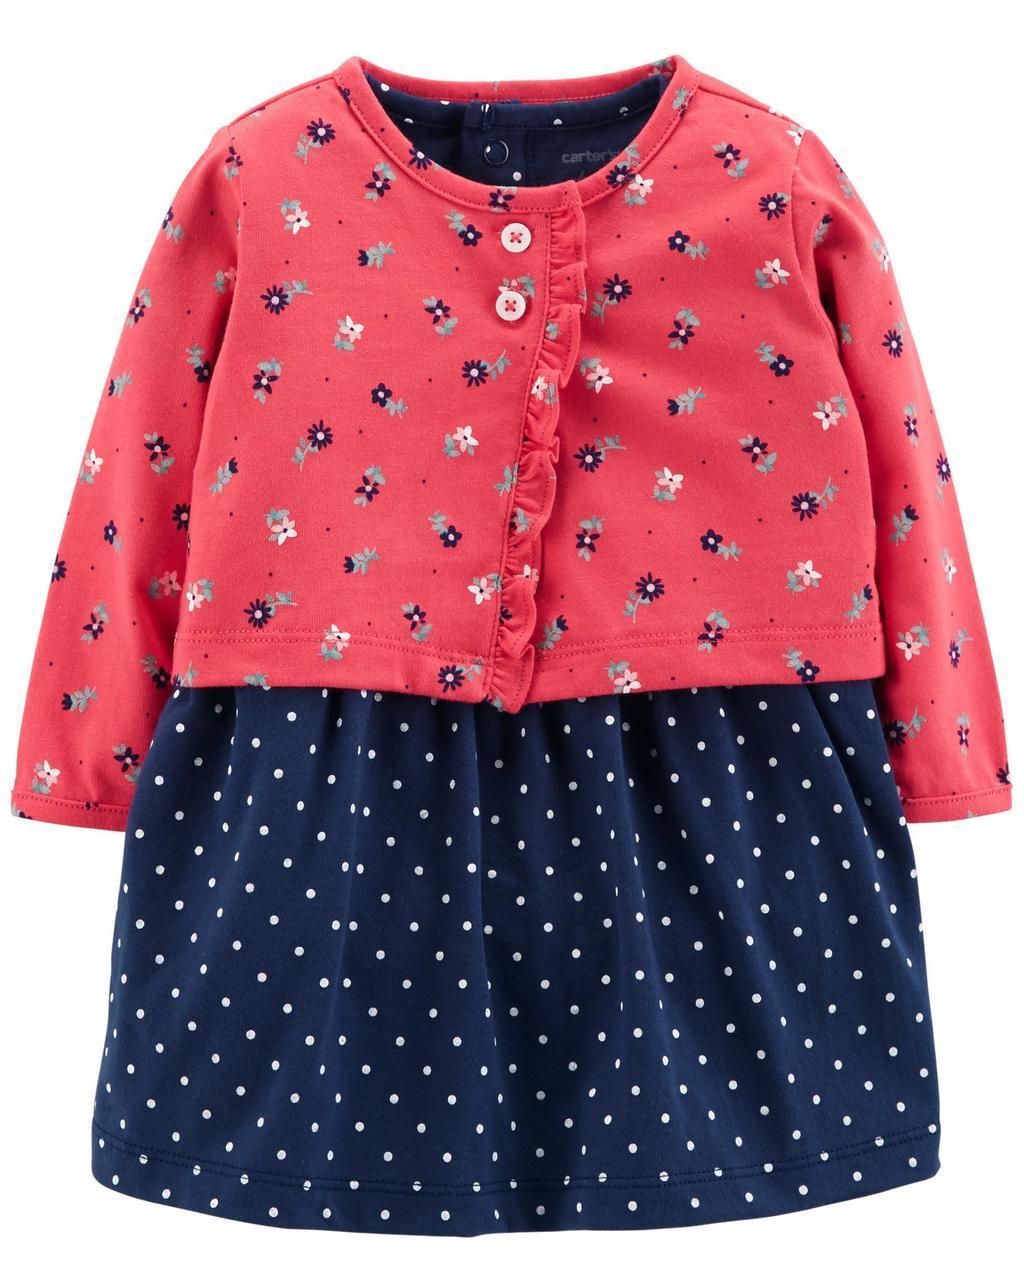 Комлект боди платье и кардиган Картерс для девочки